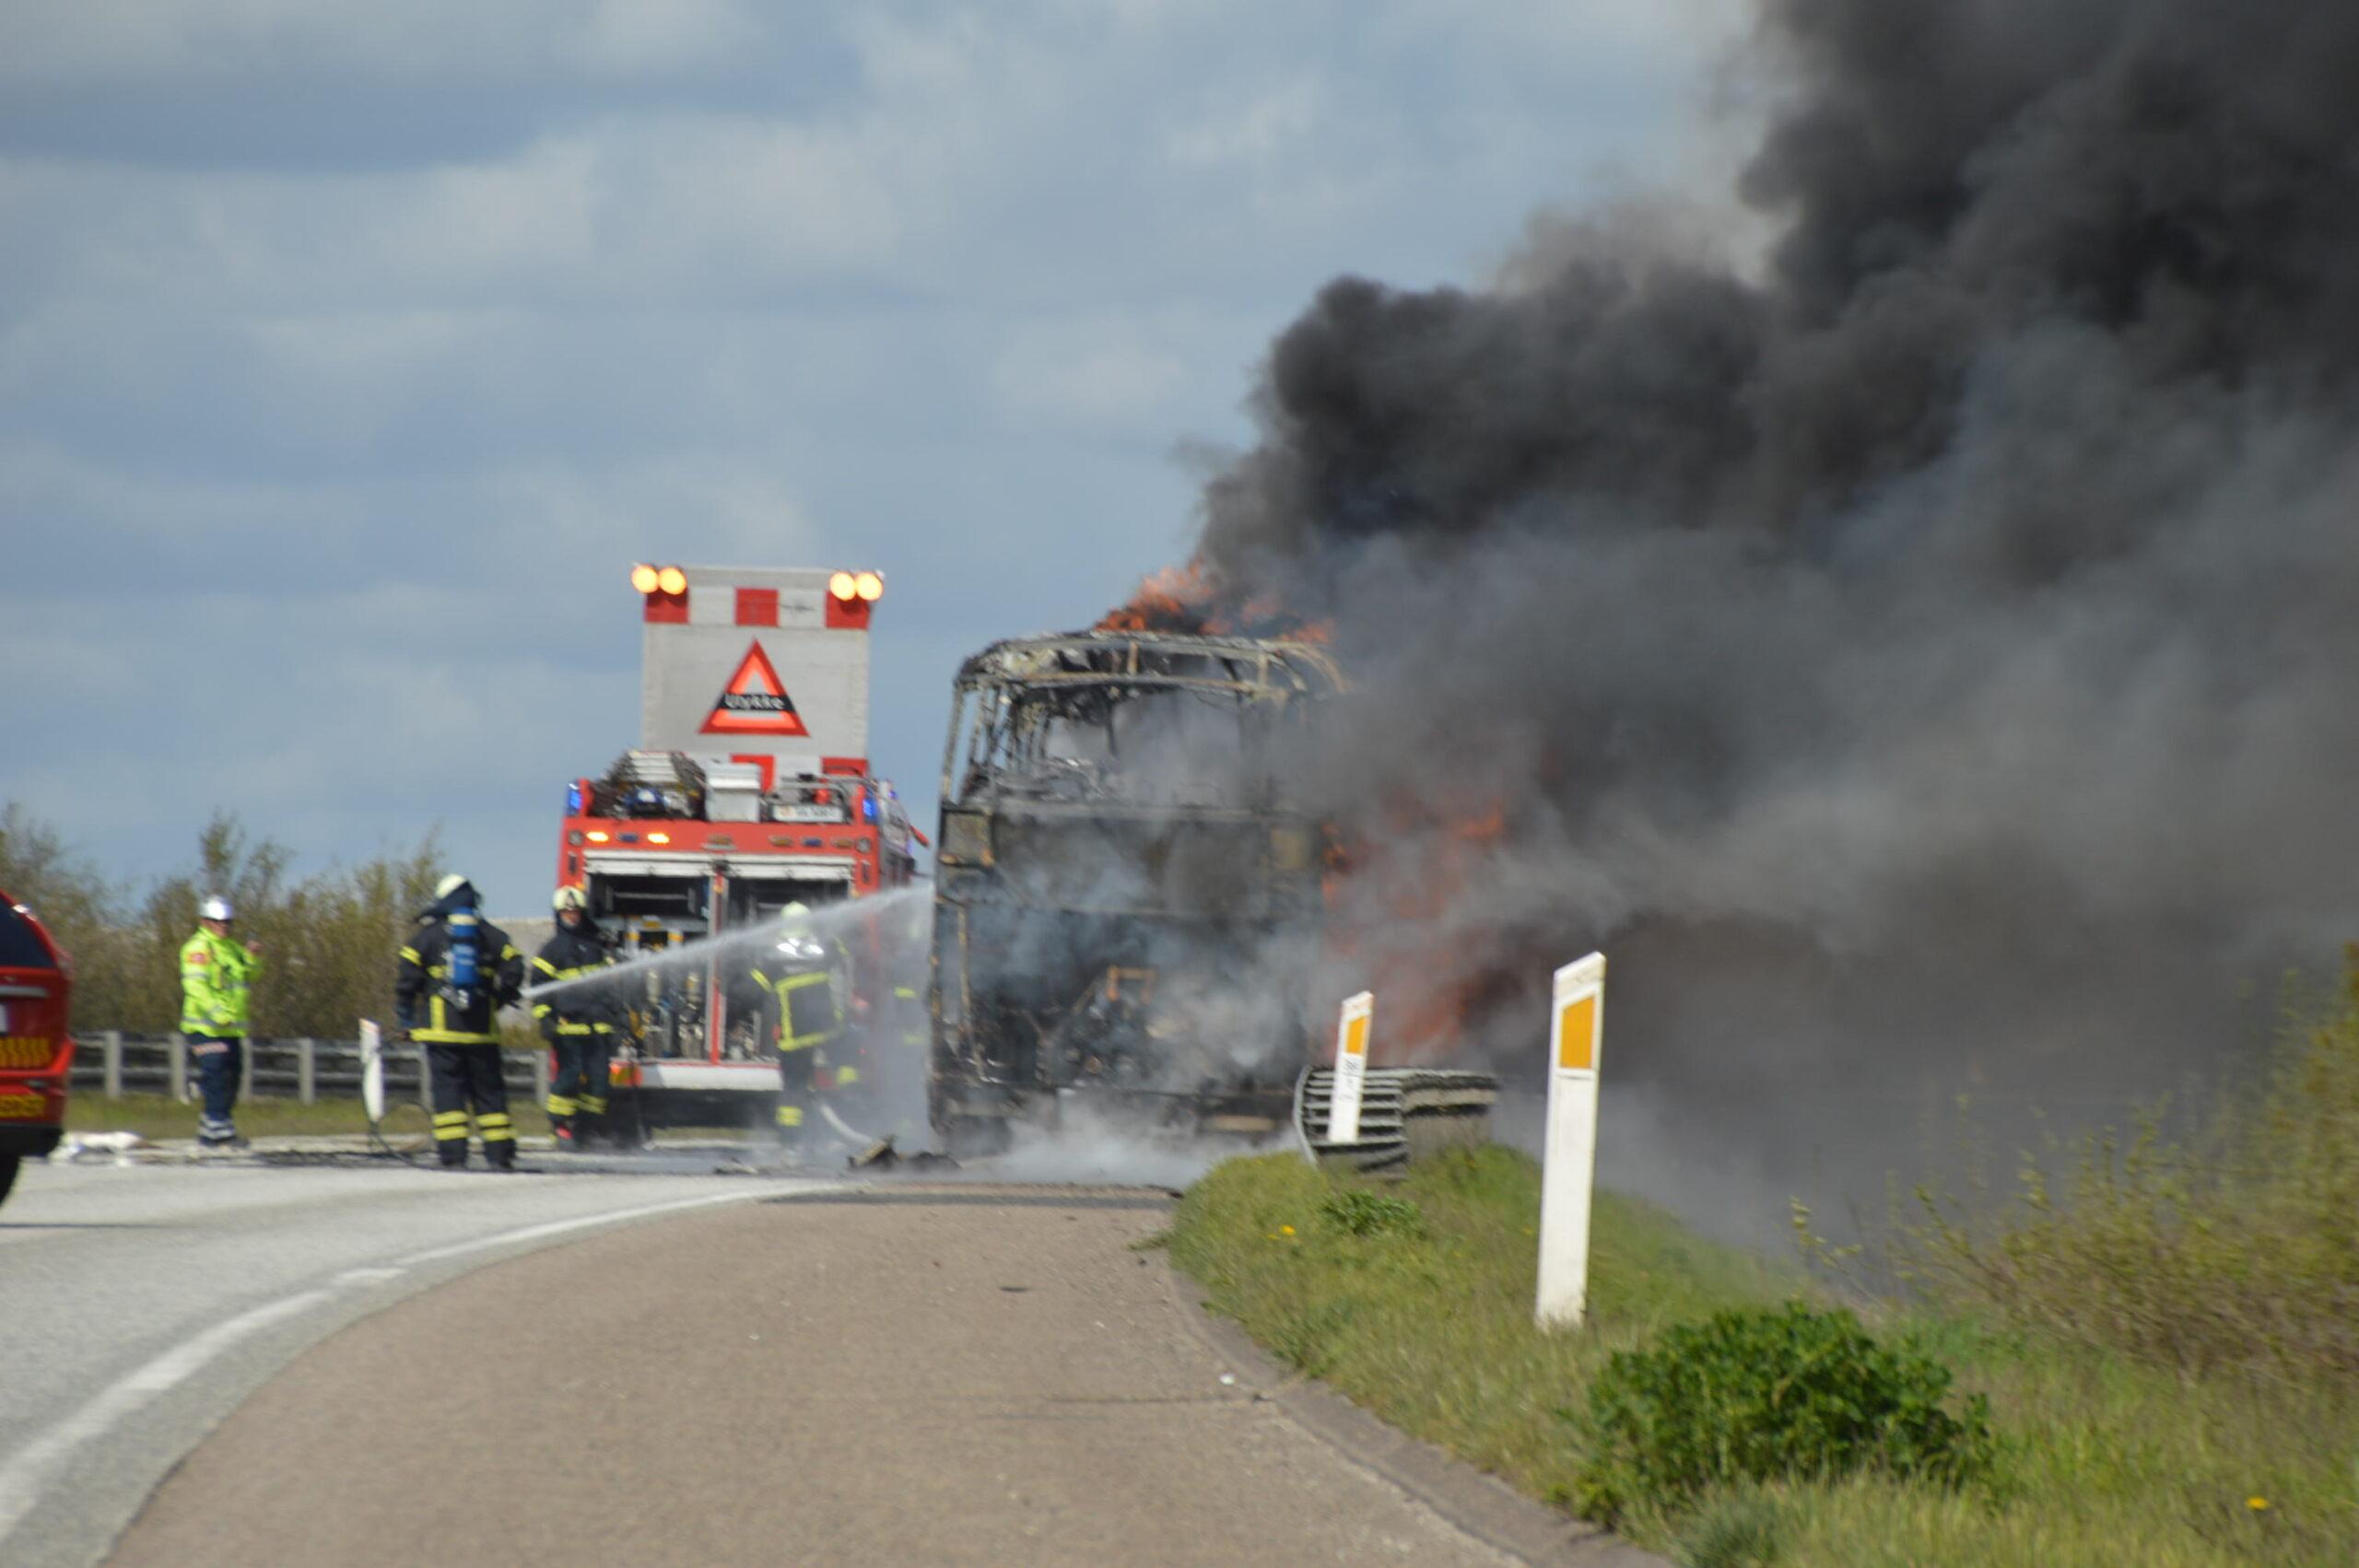 Voldsom bus brand på motorvej E20 ved Fredericia